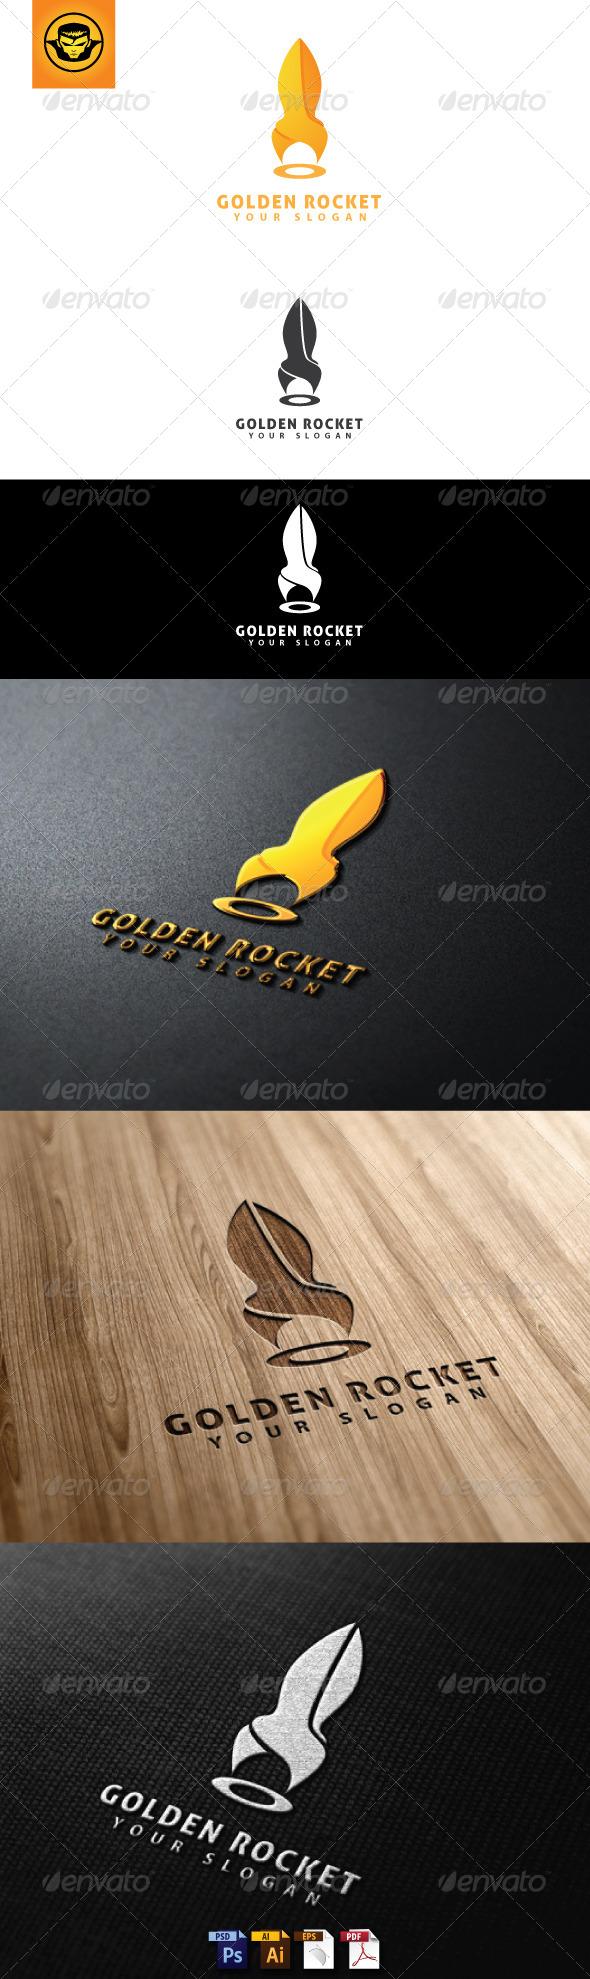 Golden Rocket Logo Template - Objects Logo Templates